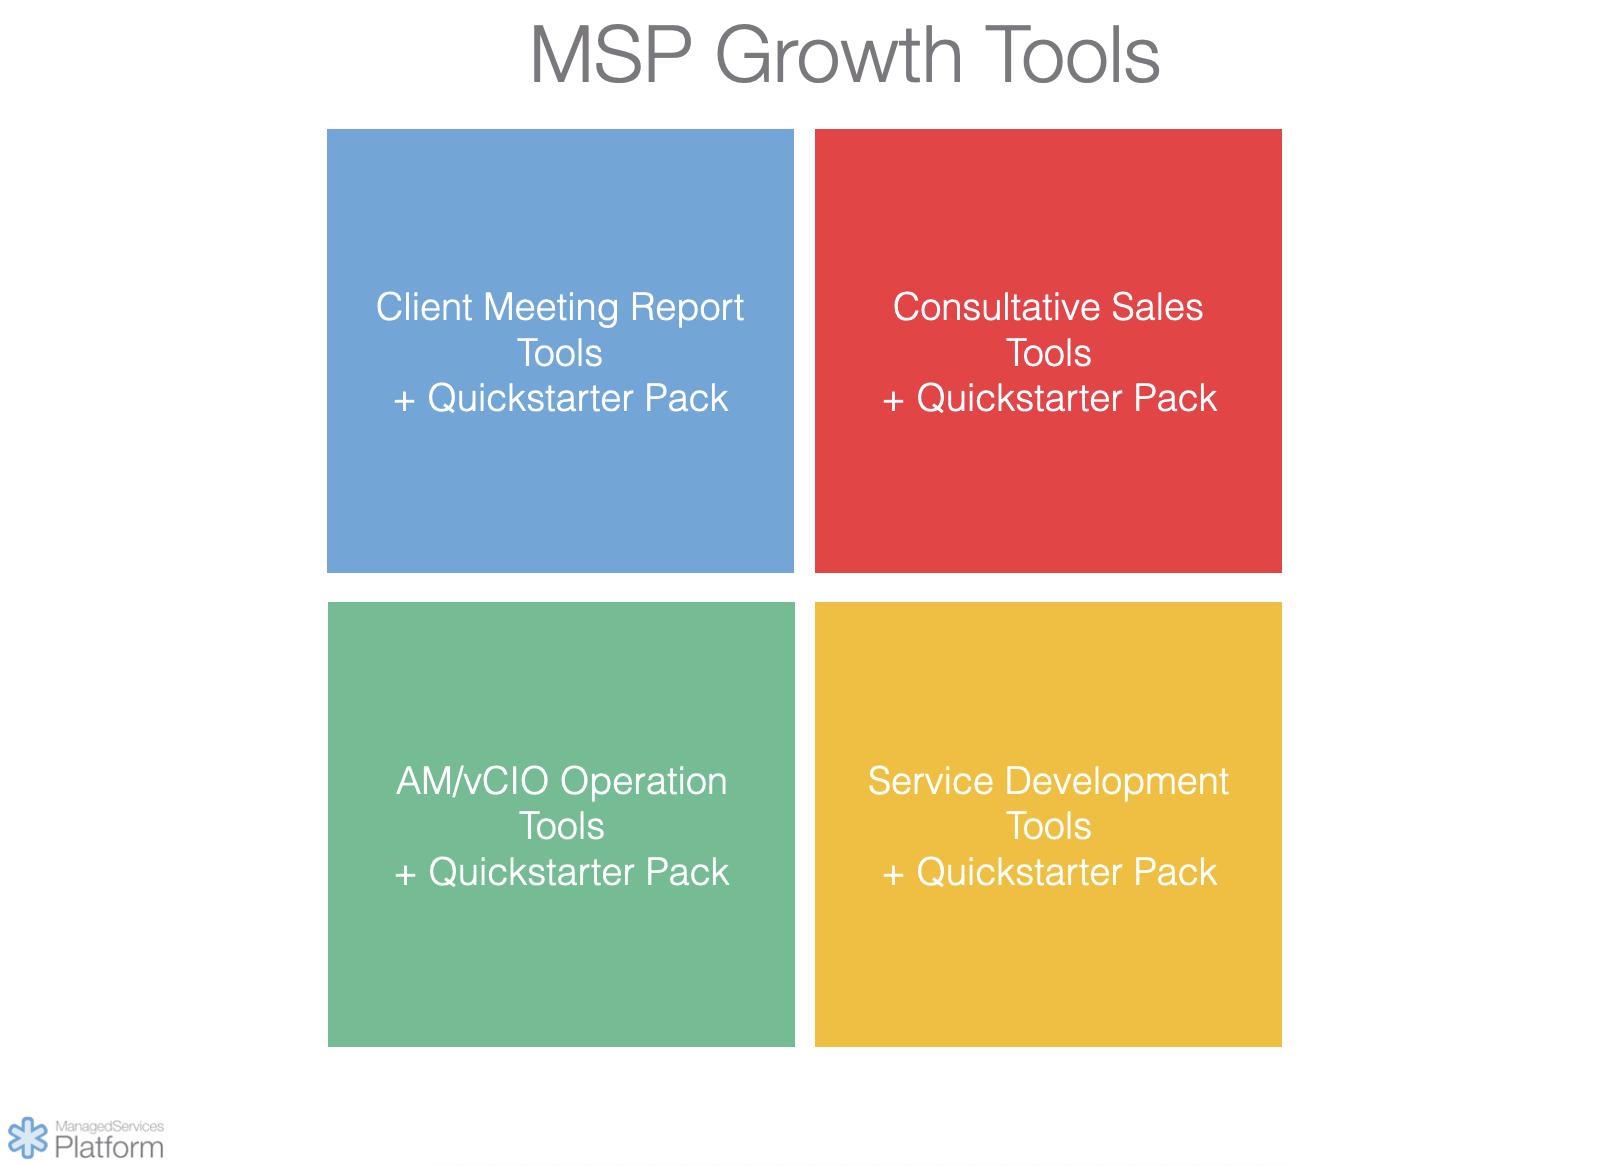 MSP growth tools